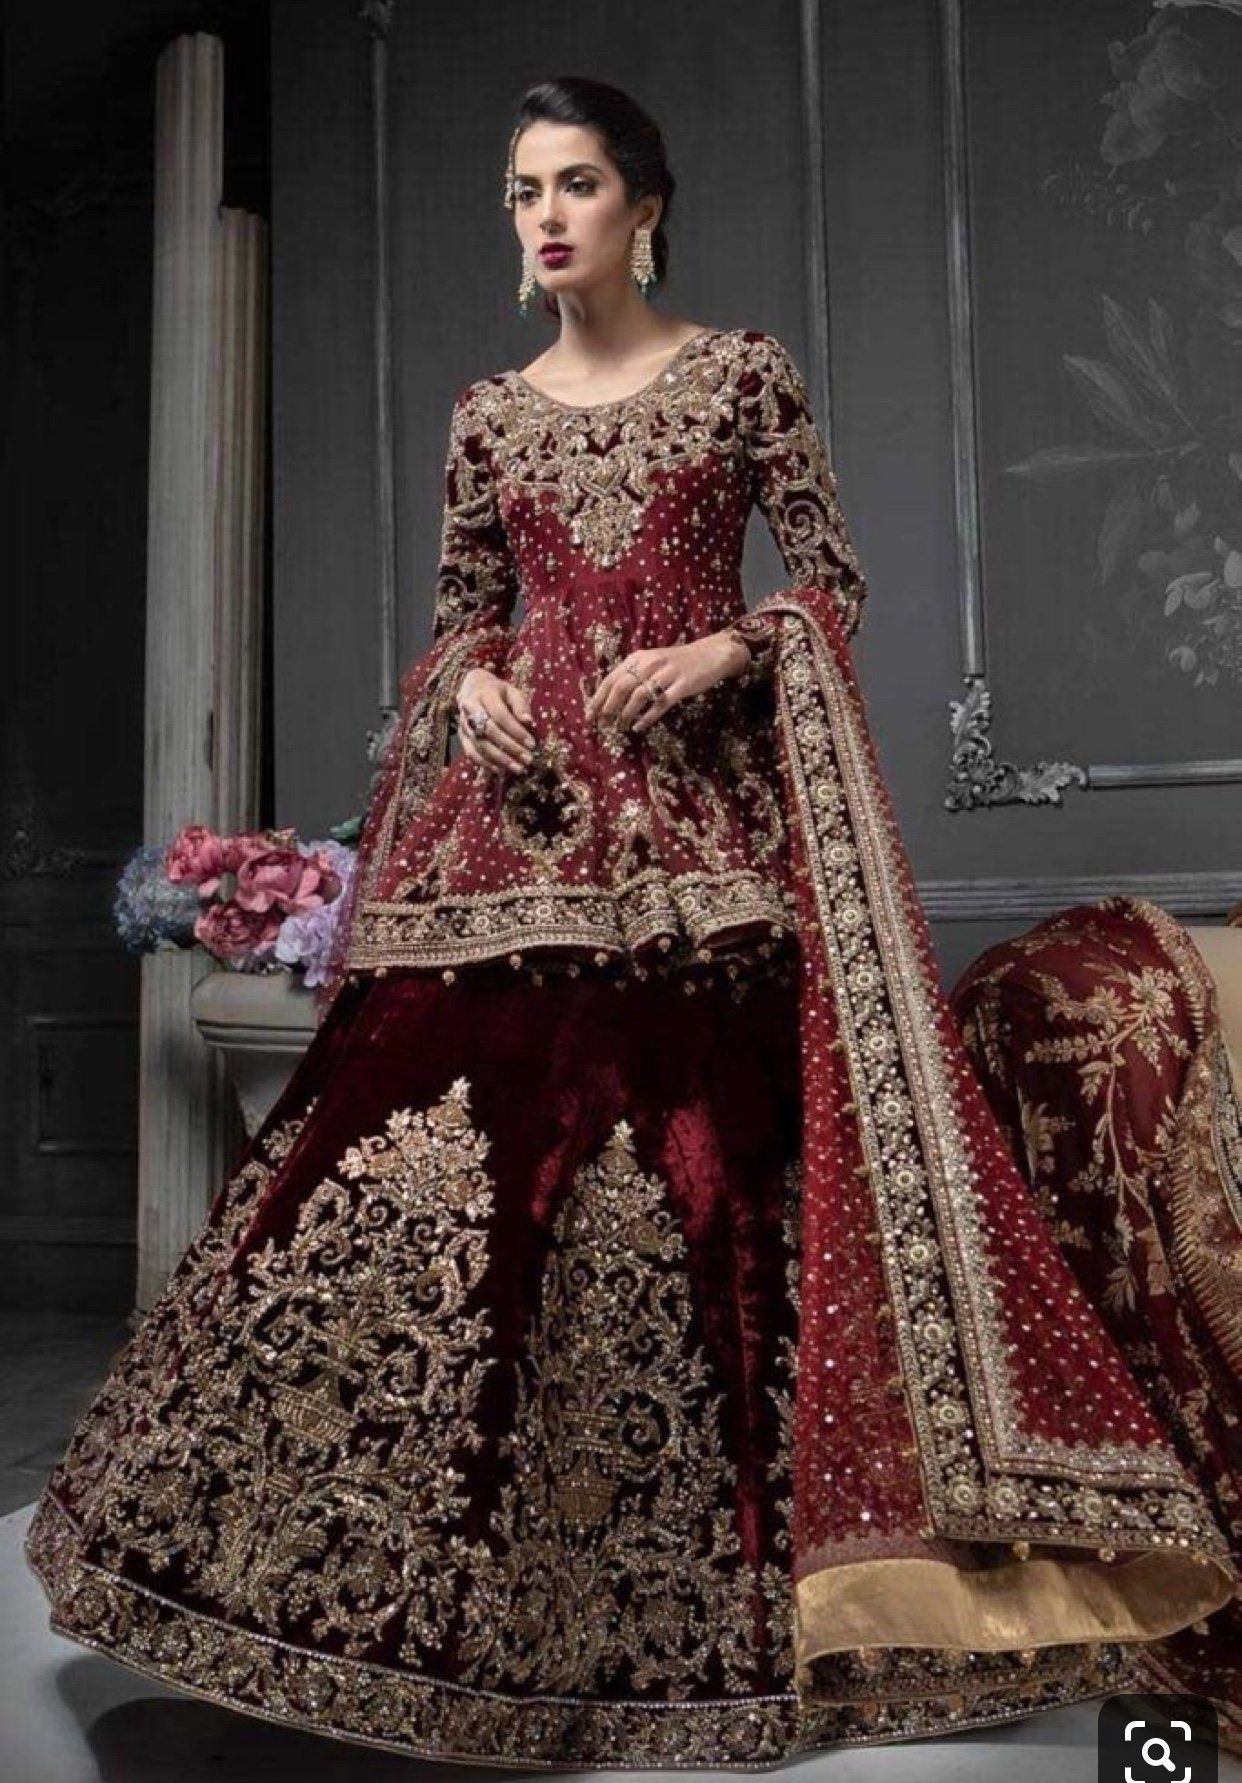 Indian Bridal Ghagra Choli In Beautiful Maroon Red Color Model B 1797 Bridal Dresses Pakistan Red Bridal Dress Pakistani Bridal Dresses [ 1783 x 1242 Pixel ]